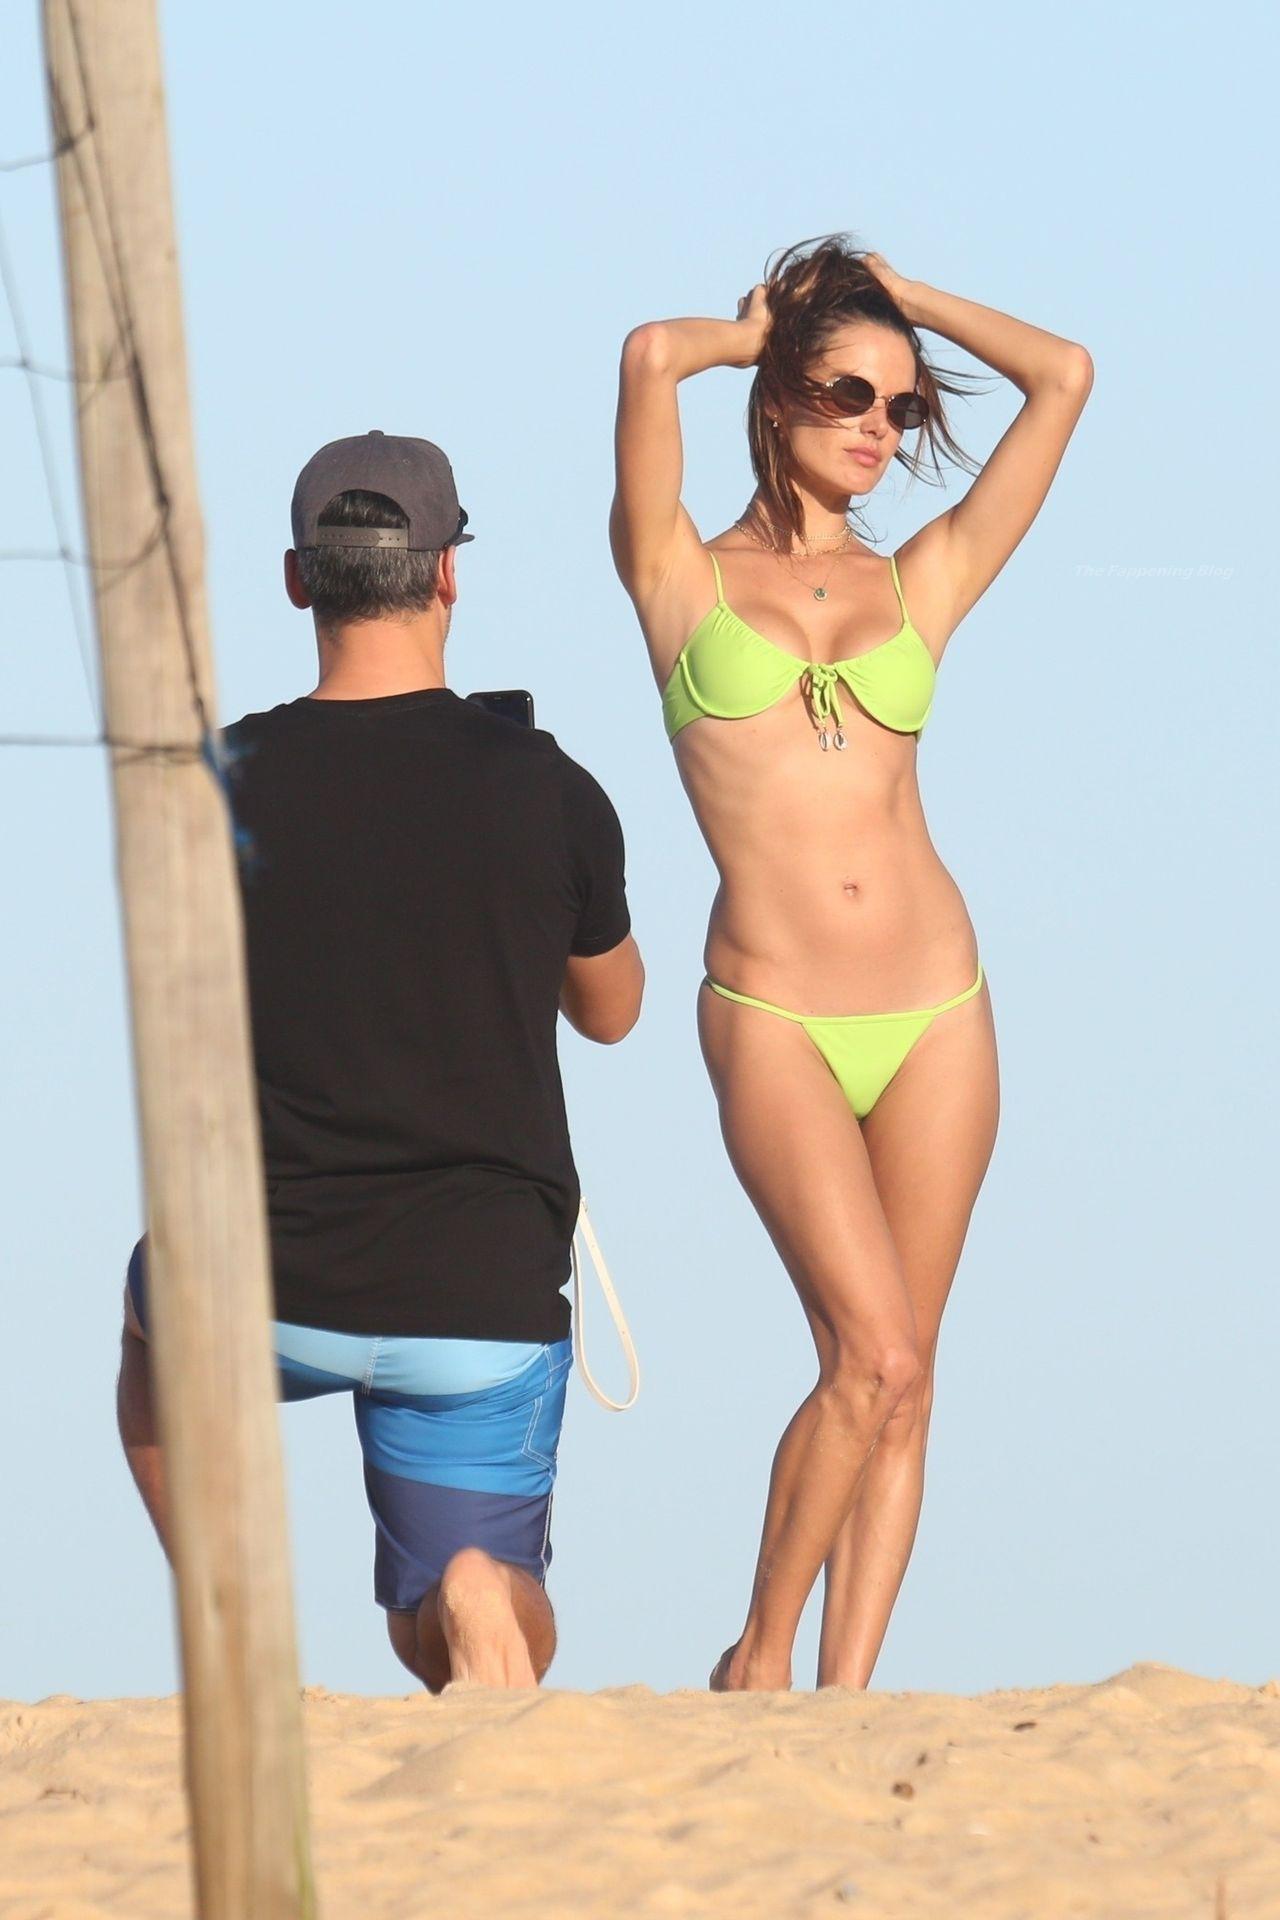 Alessandra-Ambrosio-Sexy-The-Fappening-Blog-591.jpg